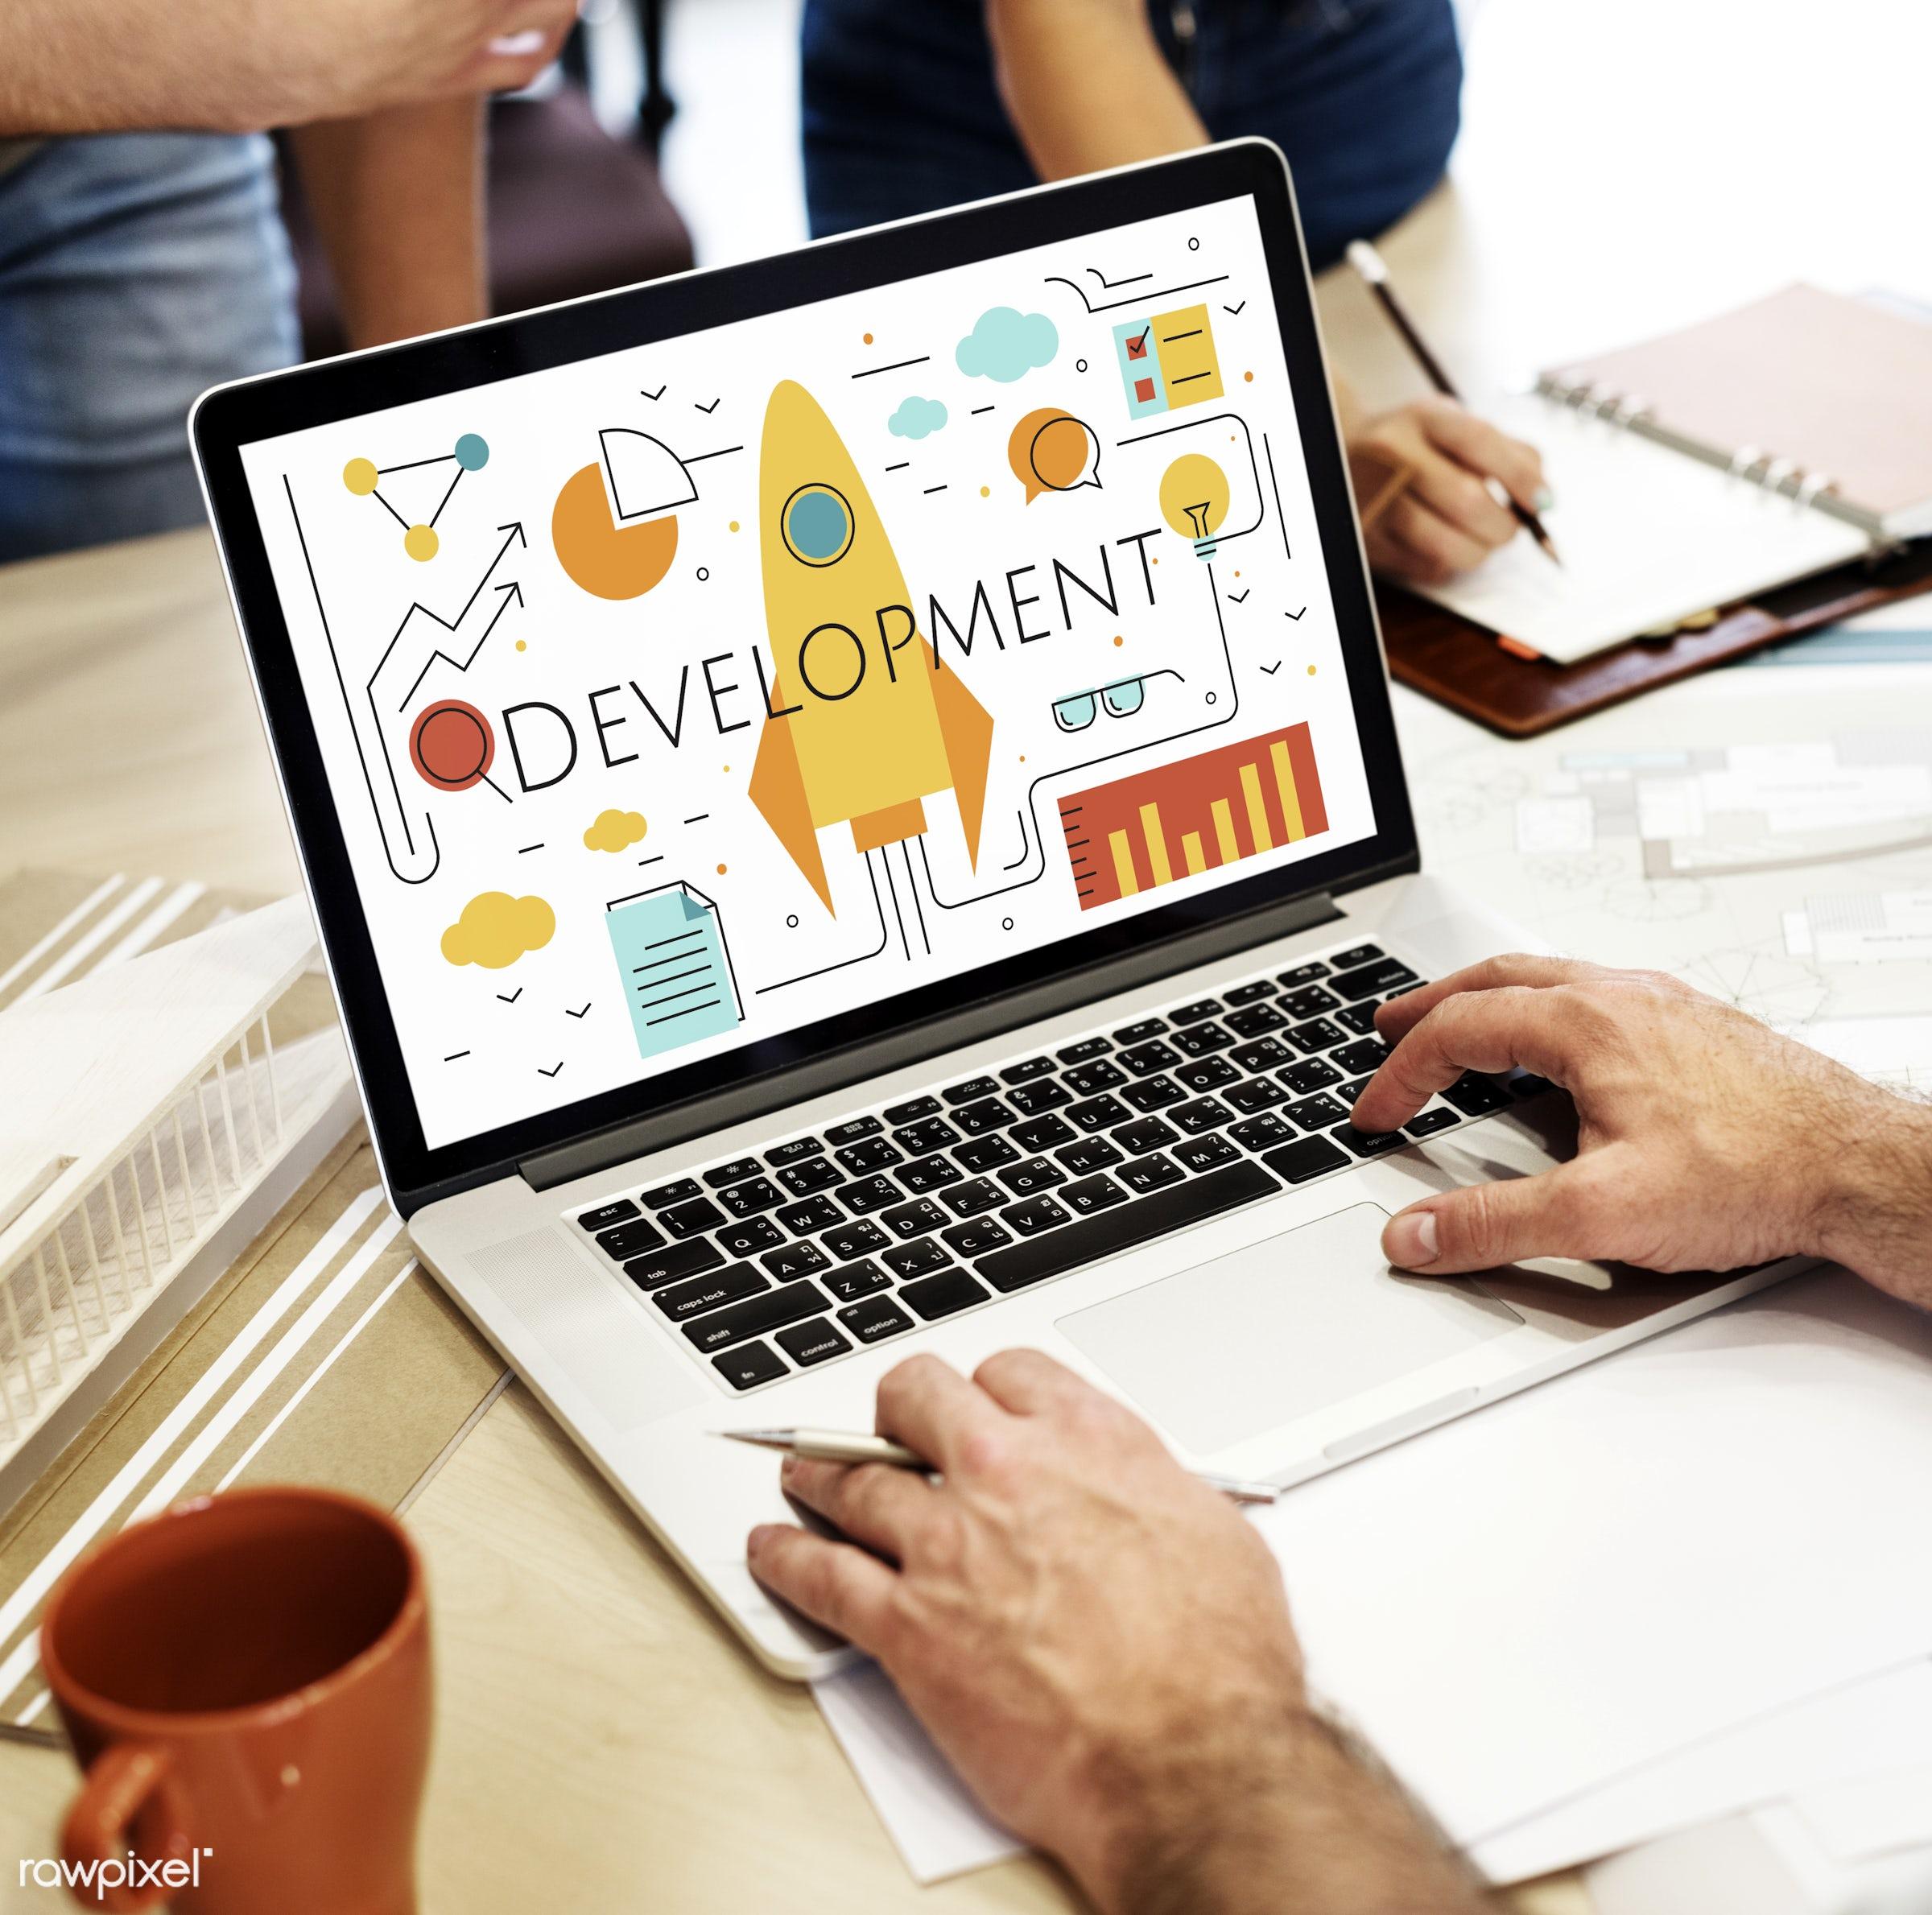 achievement, aim, analysis, architect, architecture, art, blueprint, business, coffee, coffee cup, cup, design, development...